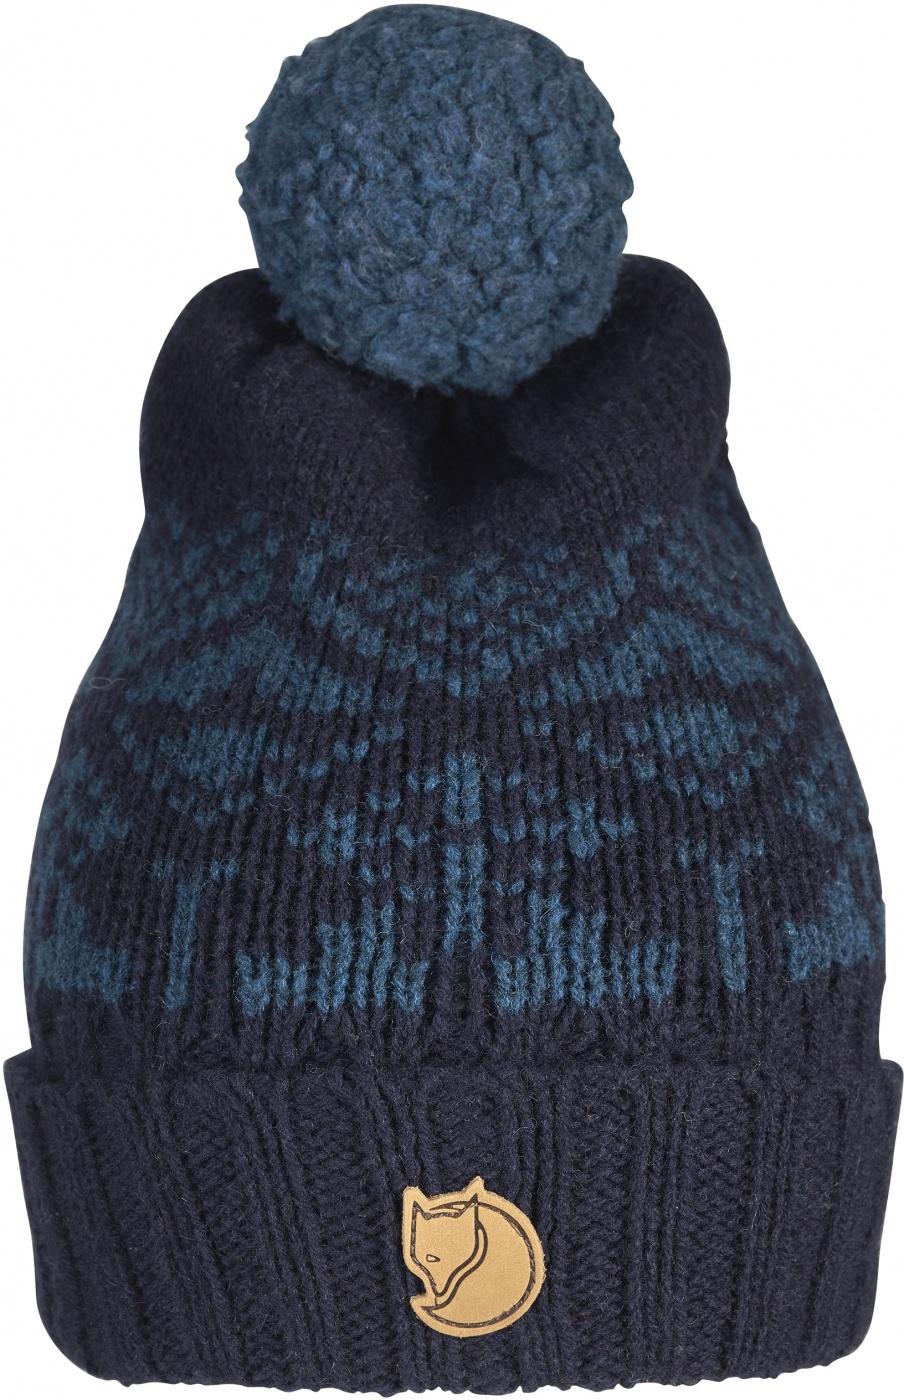 FjallRaven Snow Ball Hat Storm-30